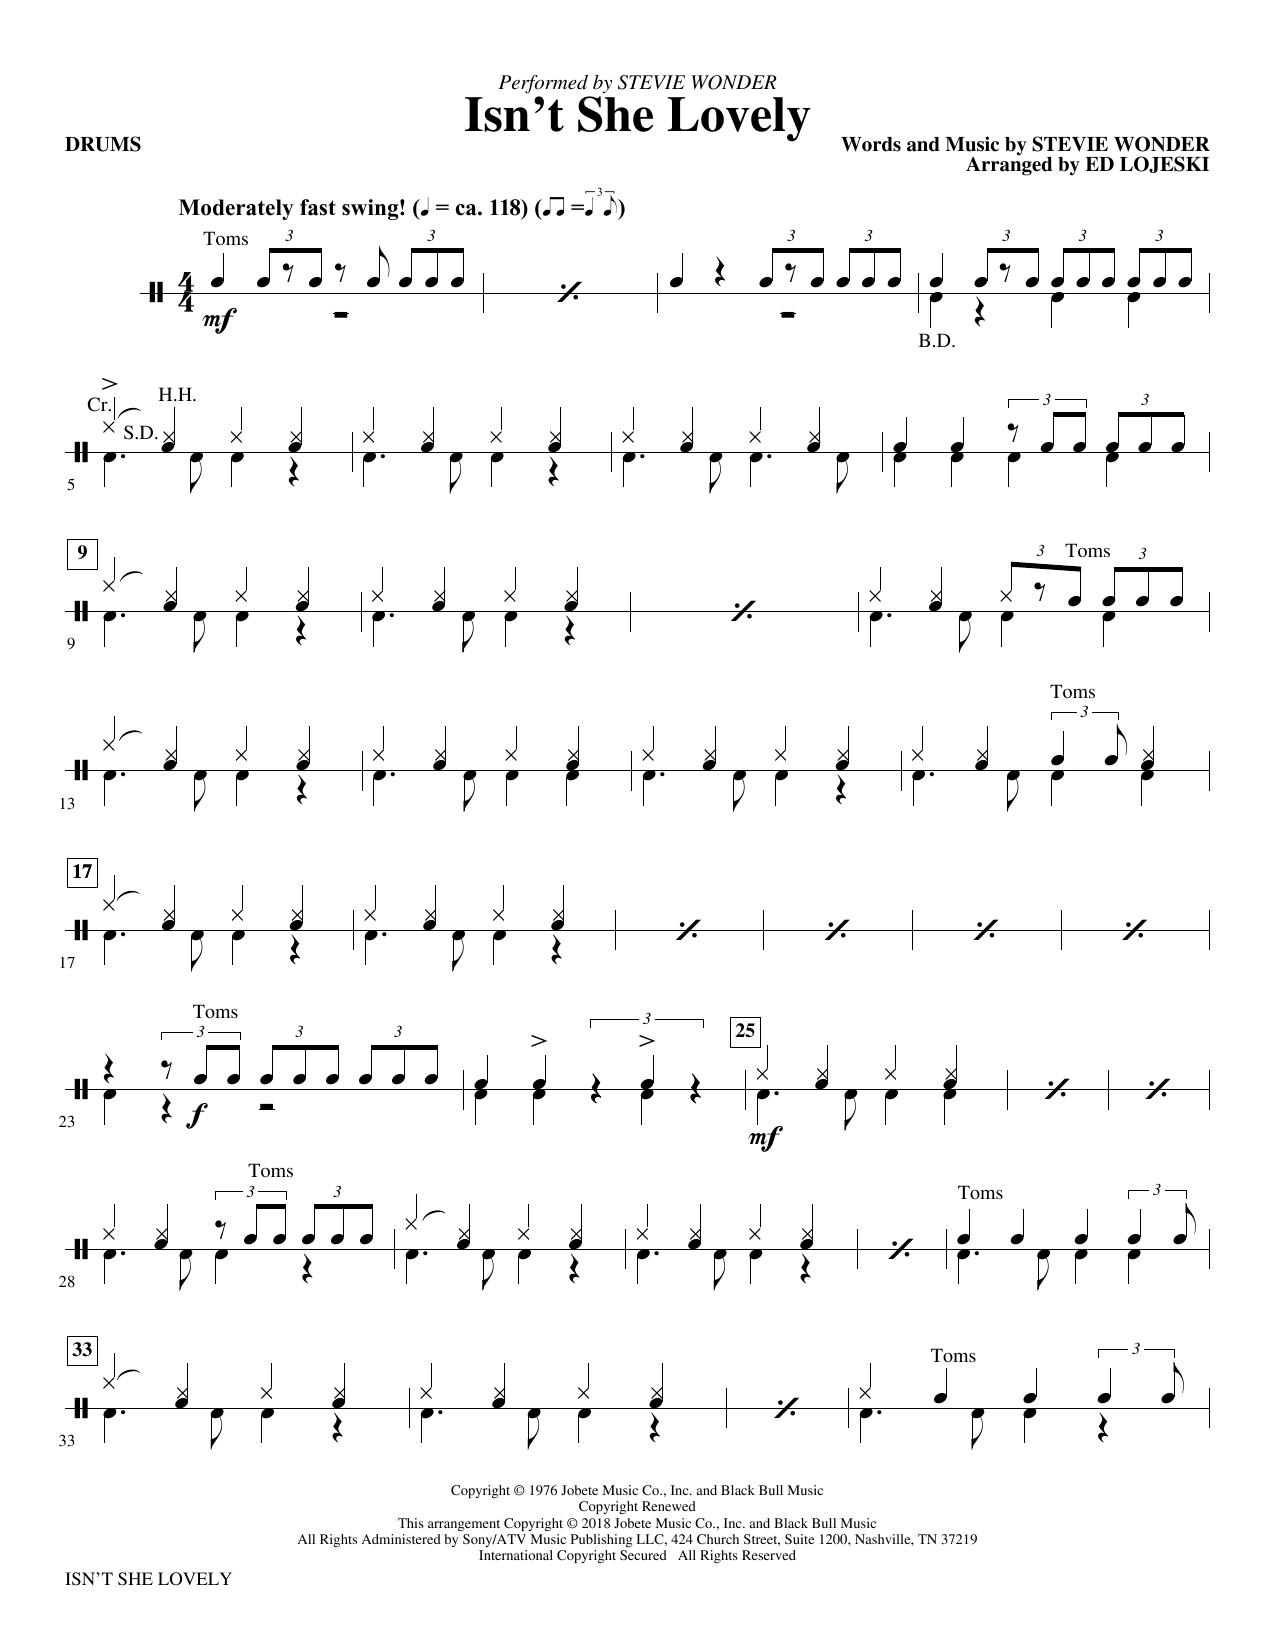 Stevie Wonder Isnt She Lovely Drums At Stantons Sheet Music